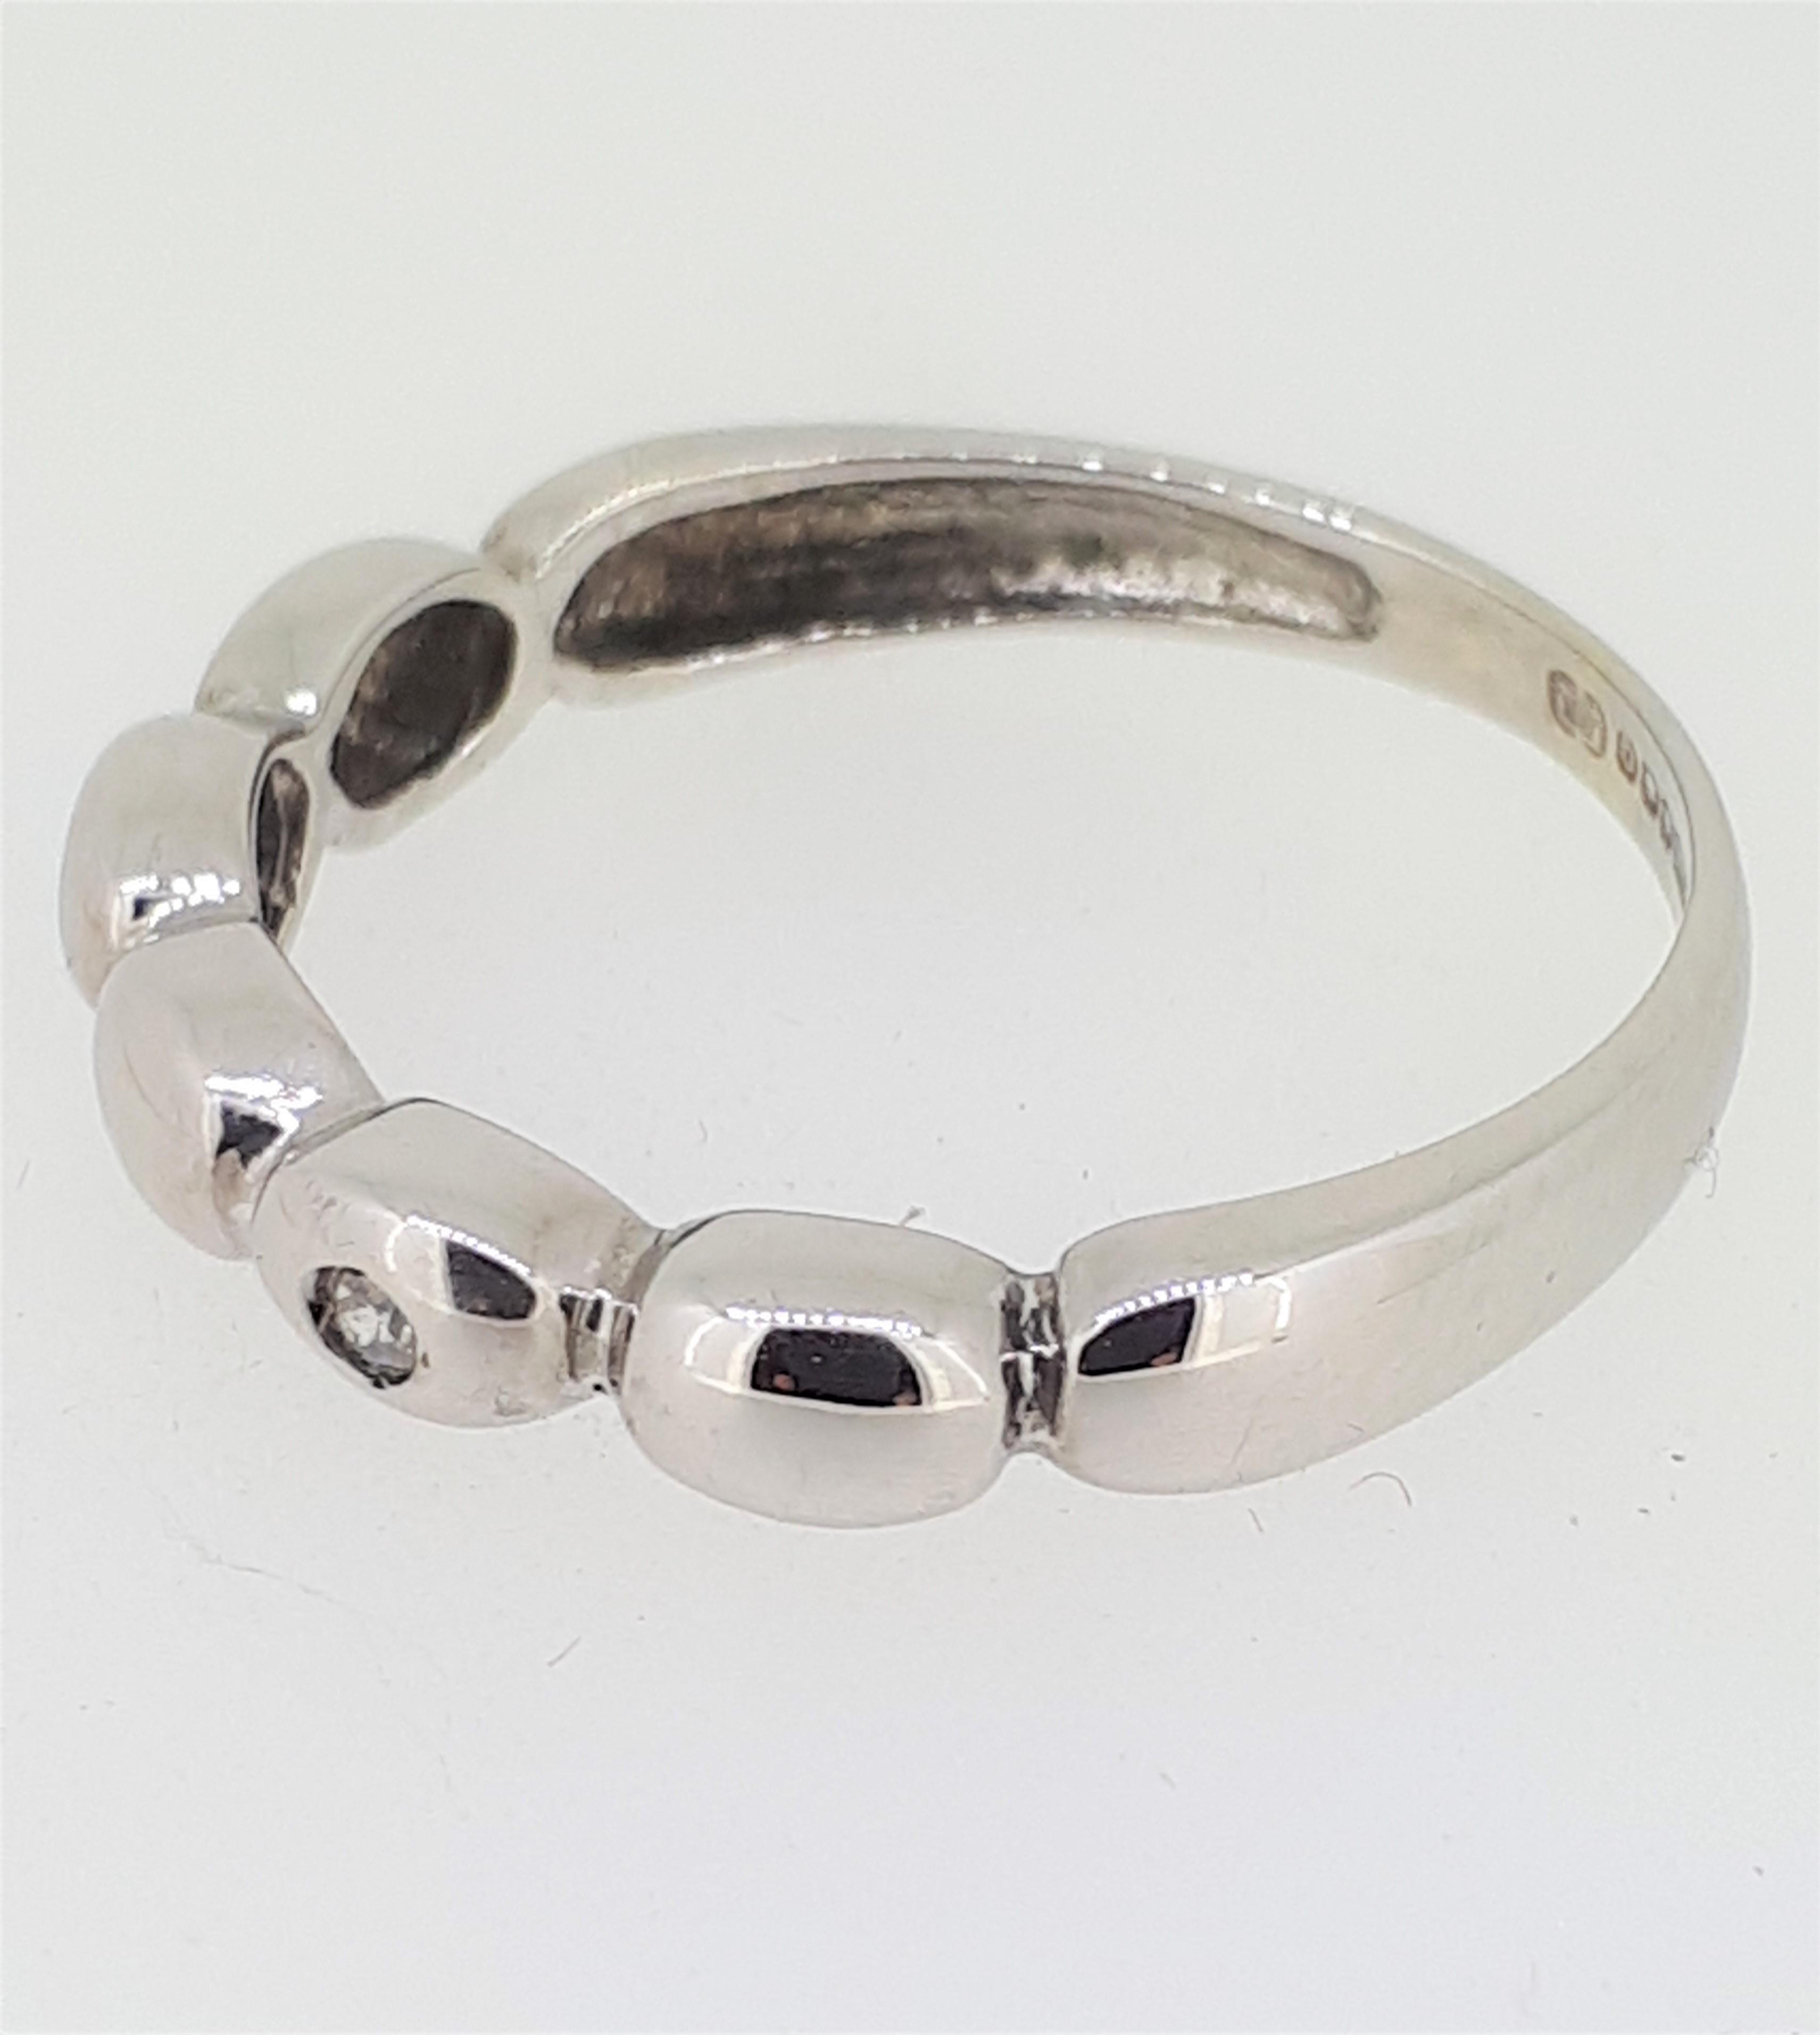 14ct (585) White Gold & Diamond Five Bead Ring - Image 3 of 6